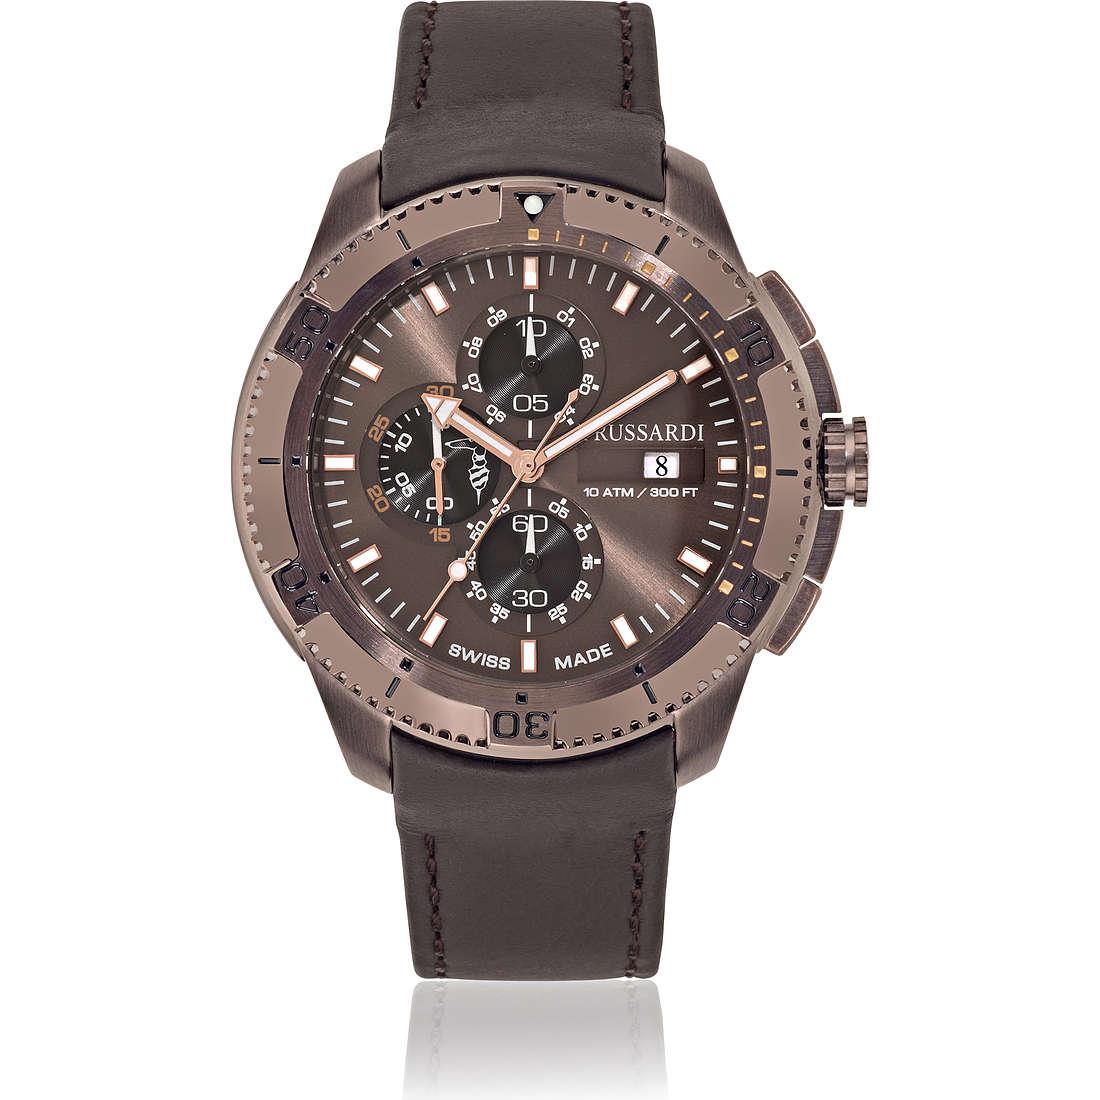 montre chronographe homme Trussardi Sportsman R2471601002